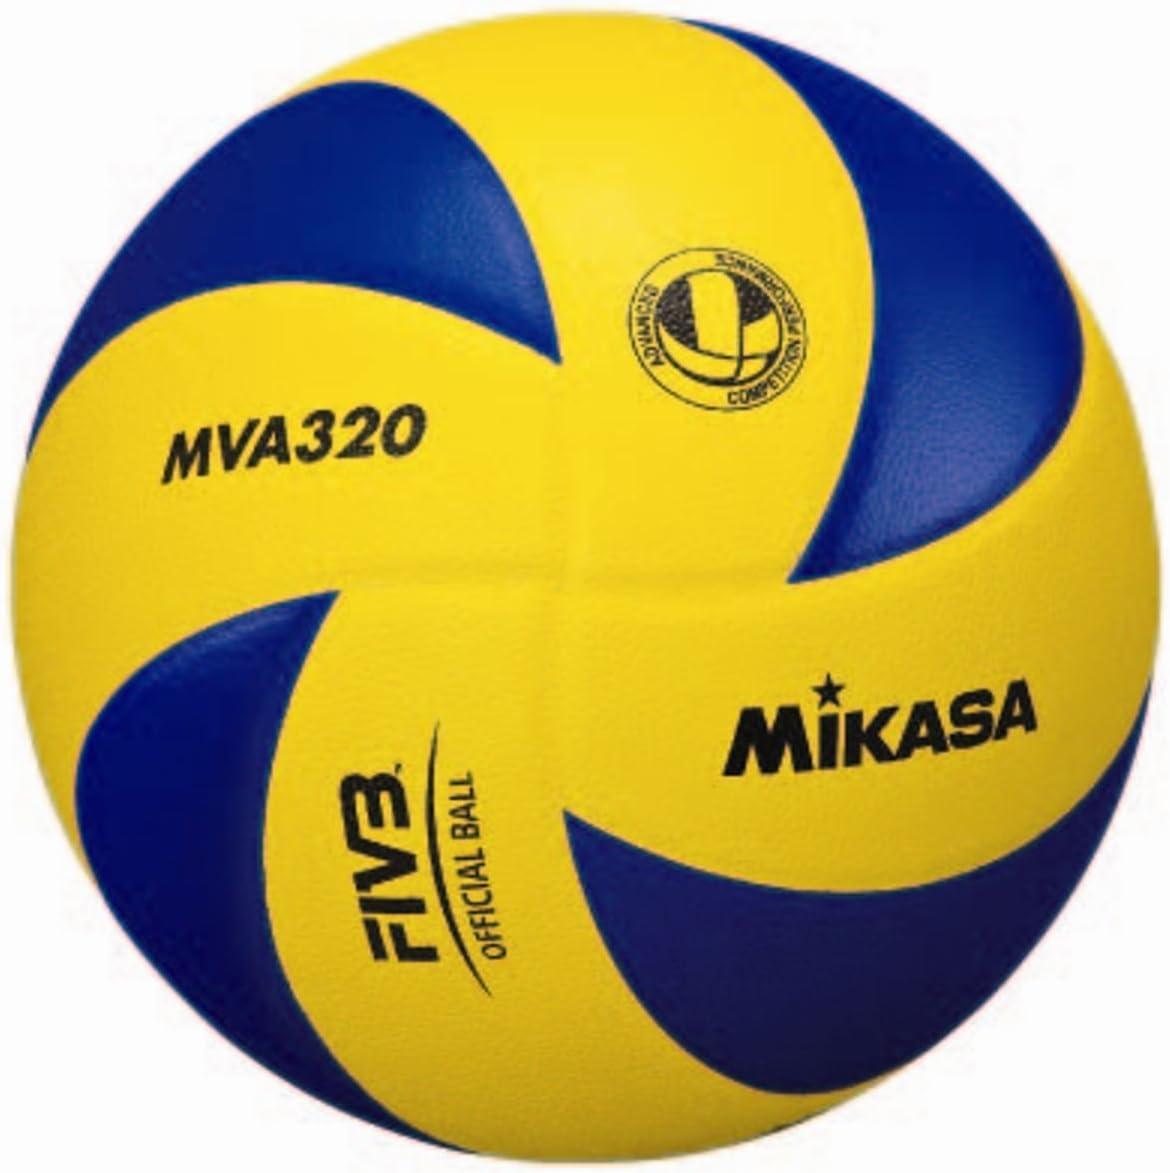 MIKASA MVA 320 - Pelota para Voleibol (Talla 5): Amazon.es ...